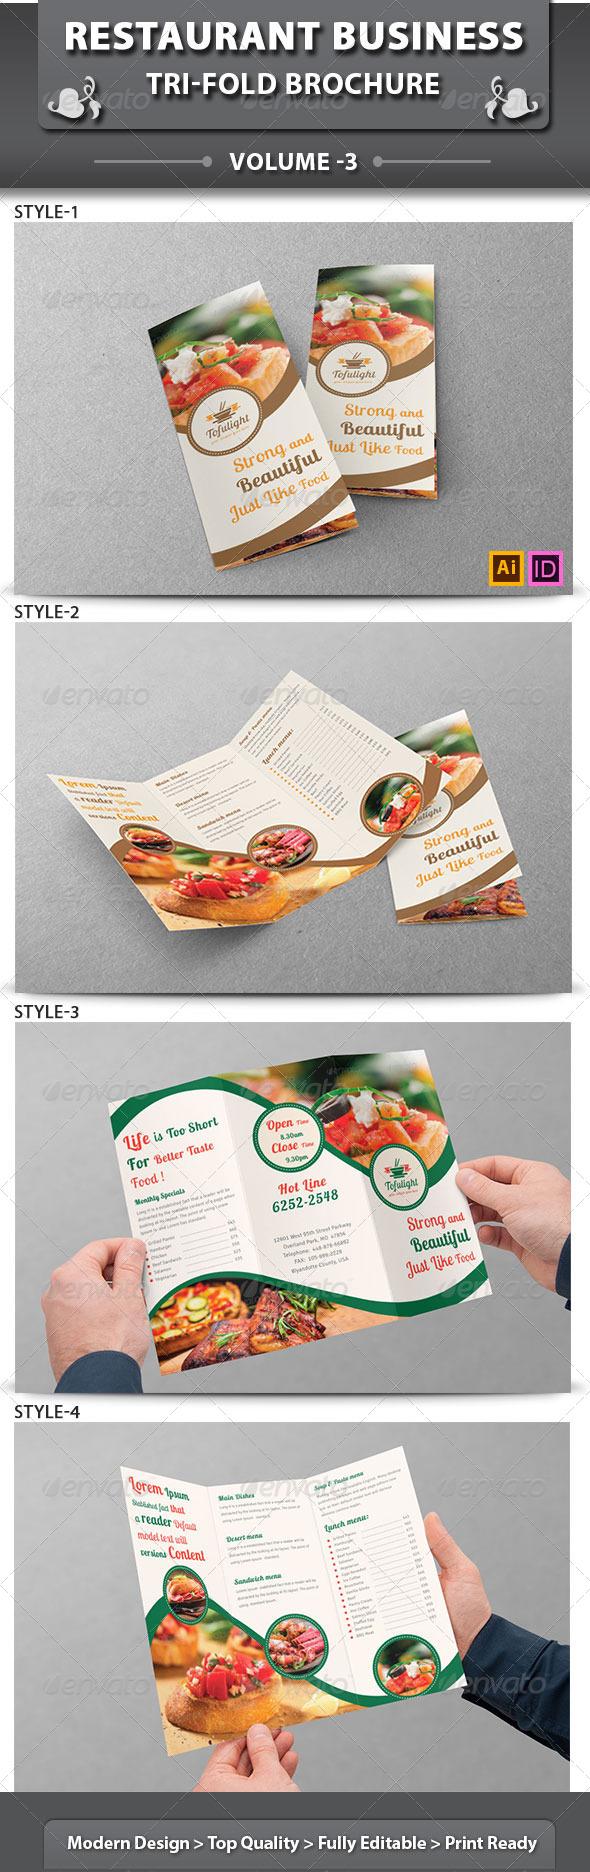 restaurant brochure templates - restaurant business tri fold brochure volume 3